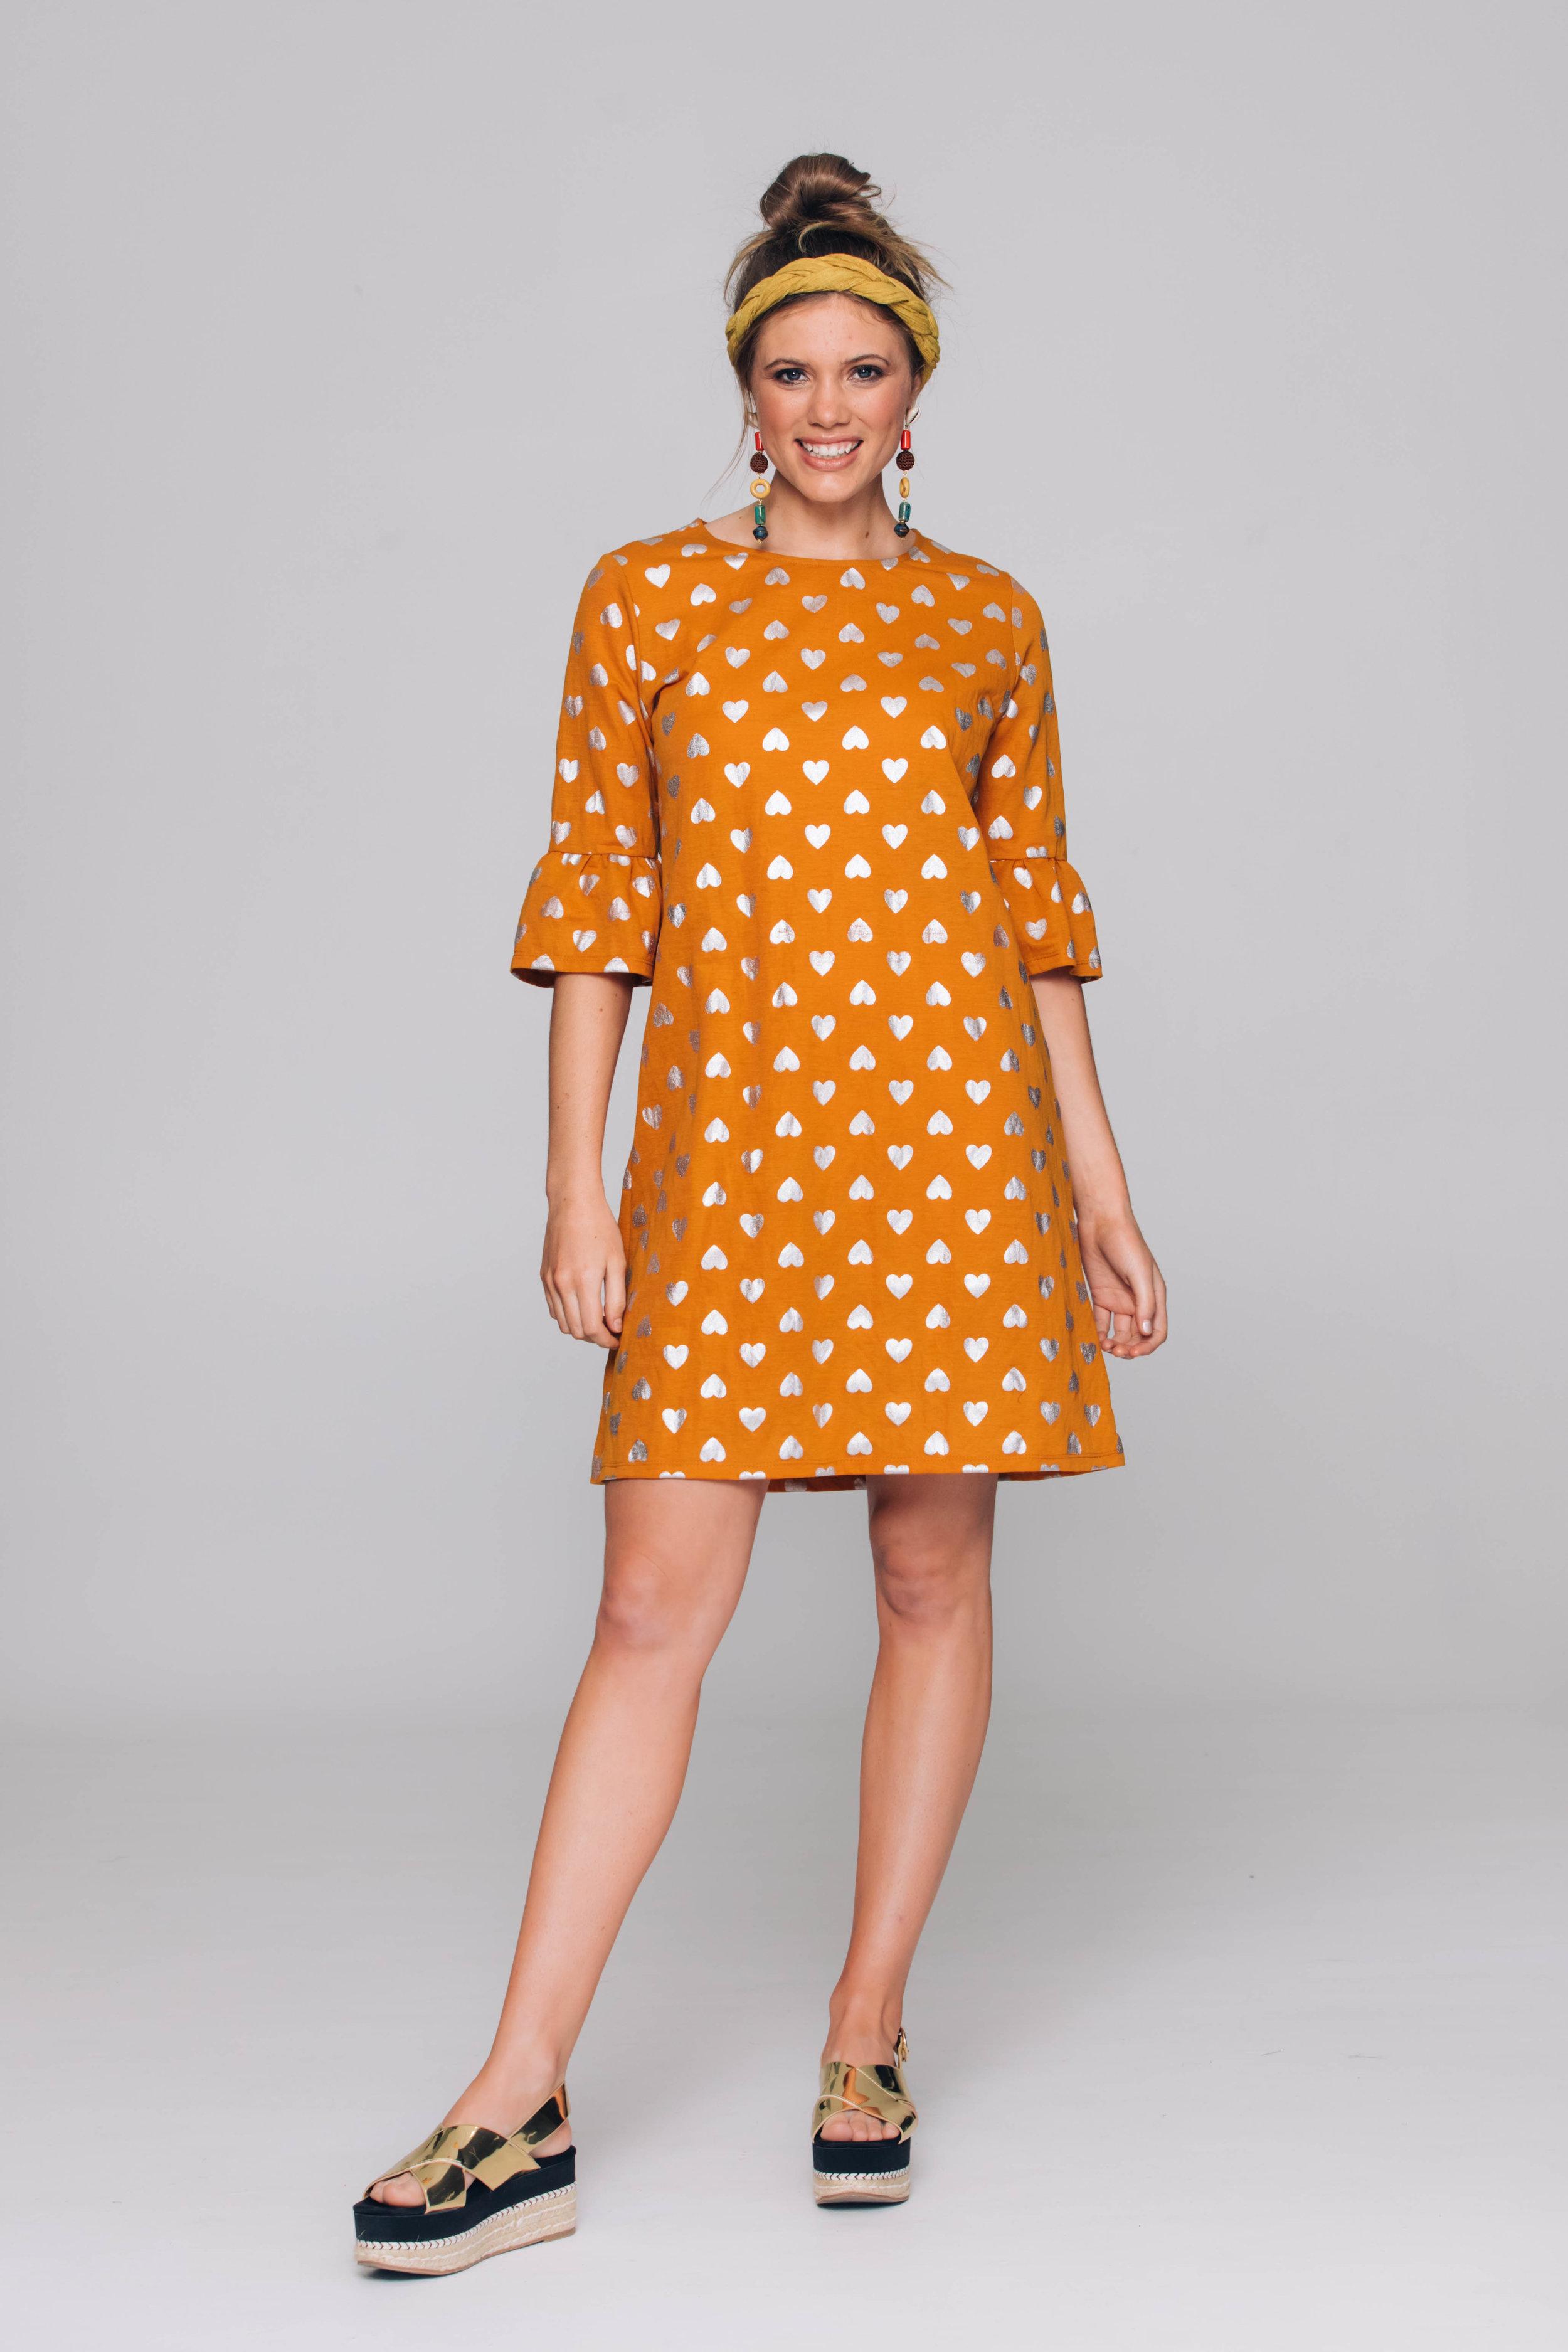 6261T Eliana Dress, Silver Bullet Mustard